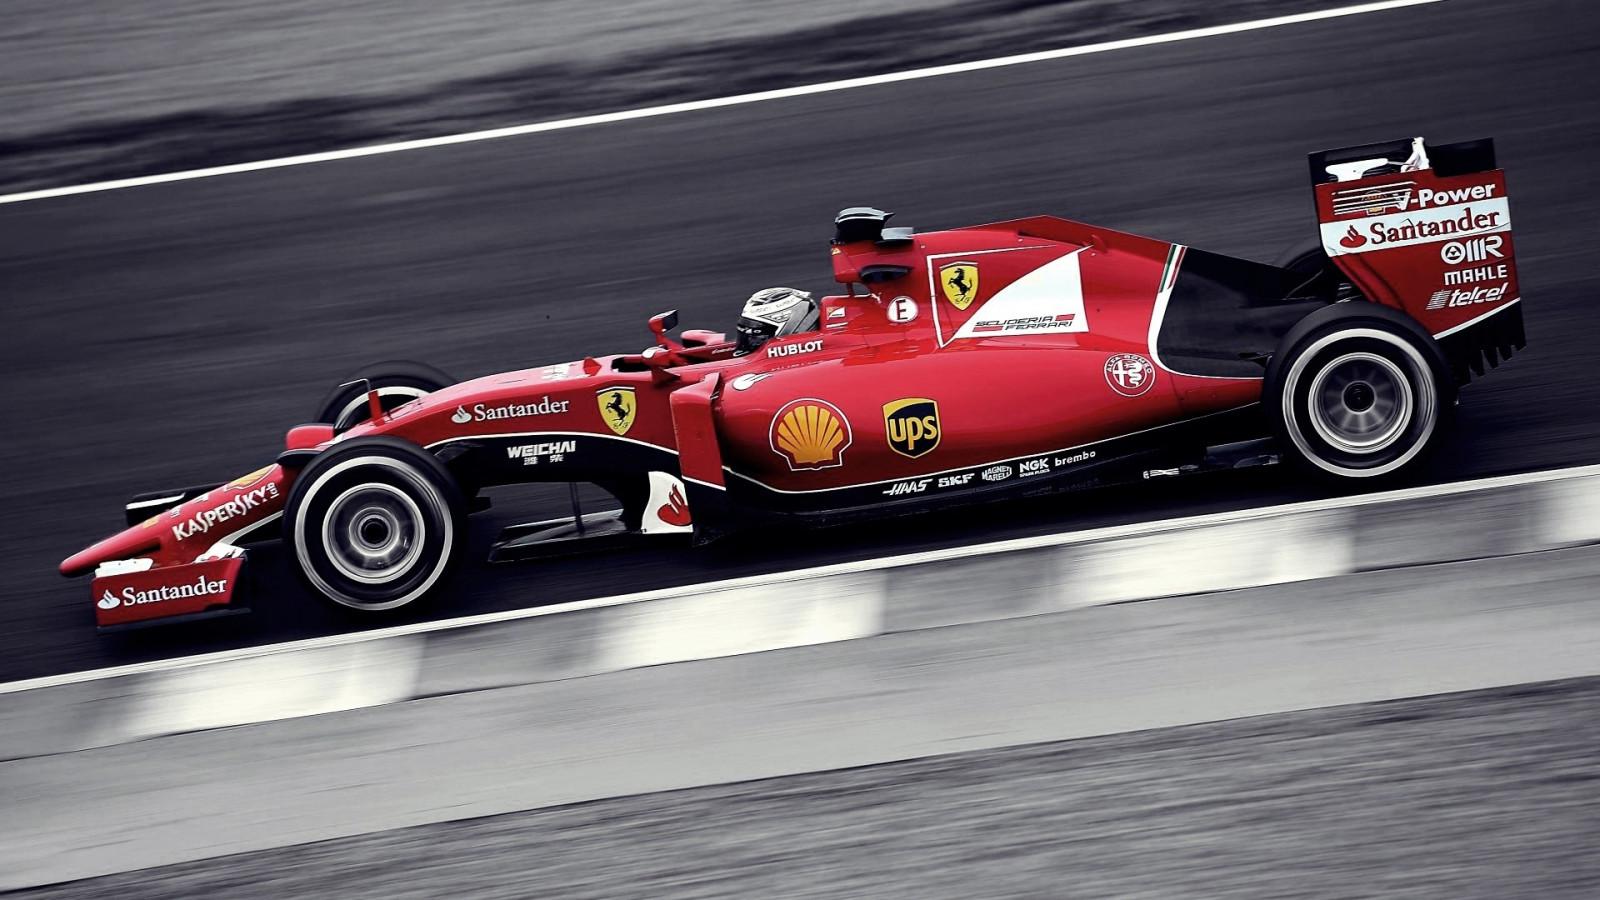 Wallpaper Mobil Balap Mewarnai Selektif Mobil Sport Ferrari F1